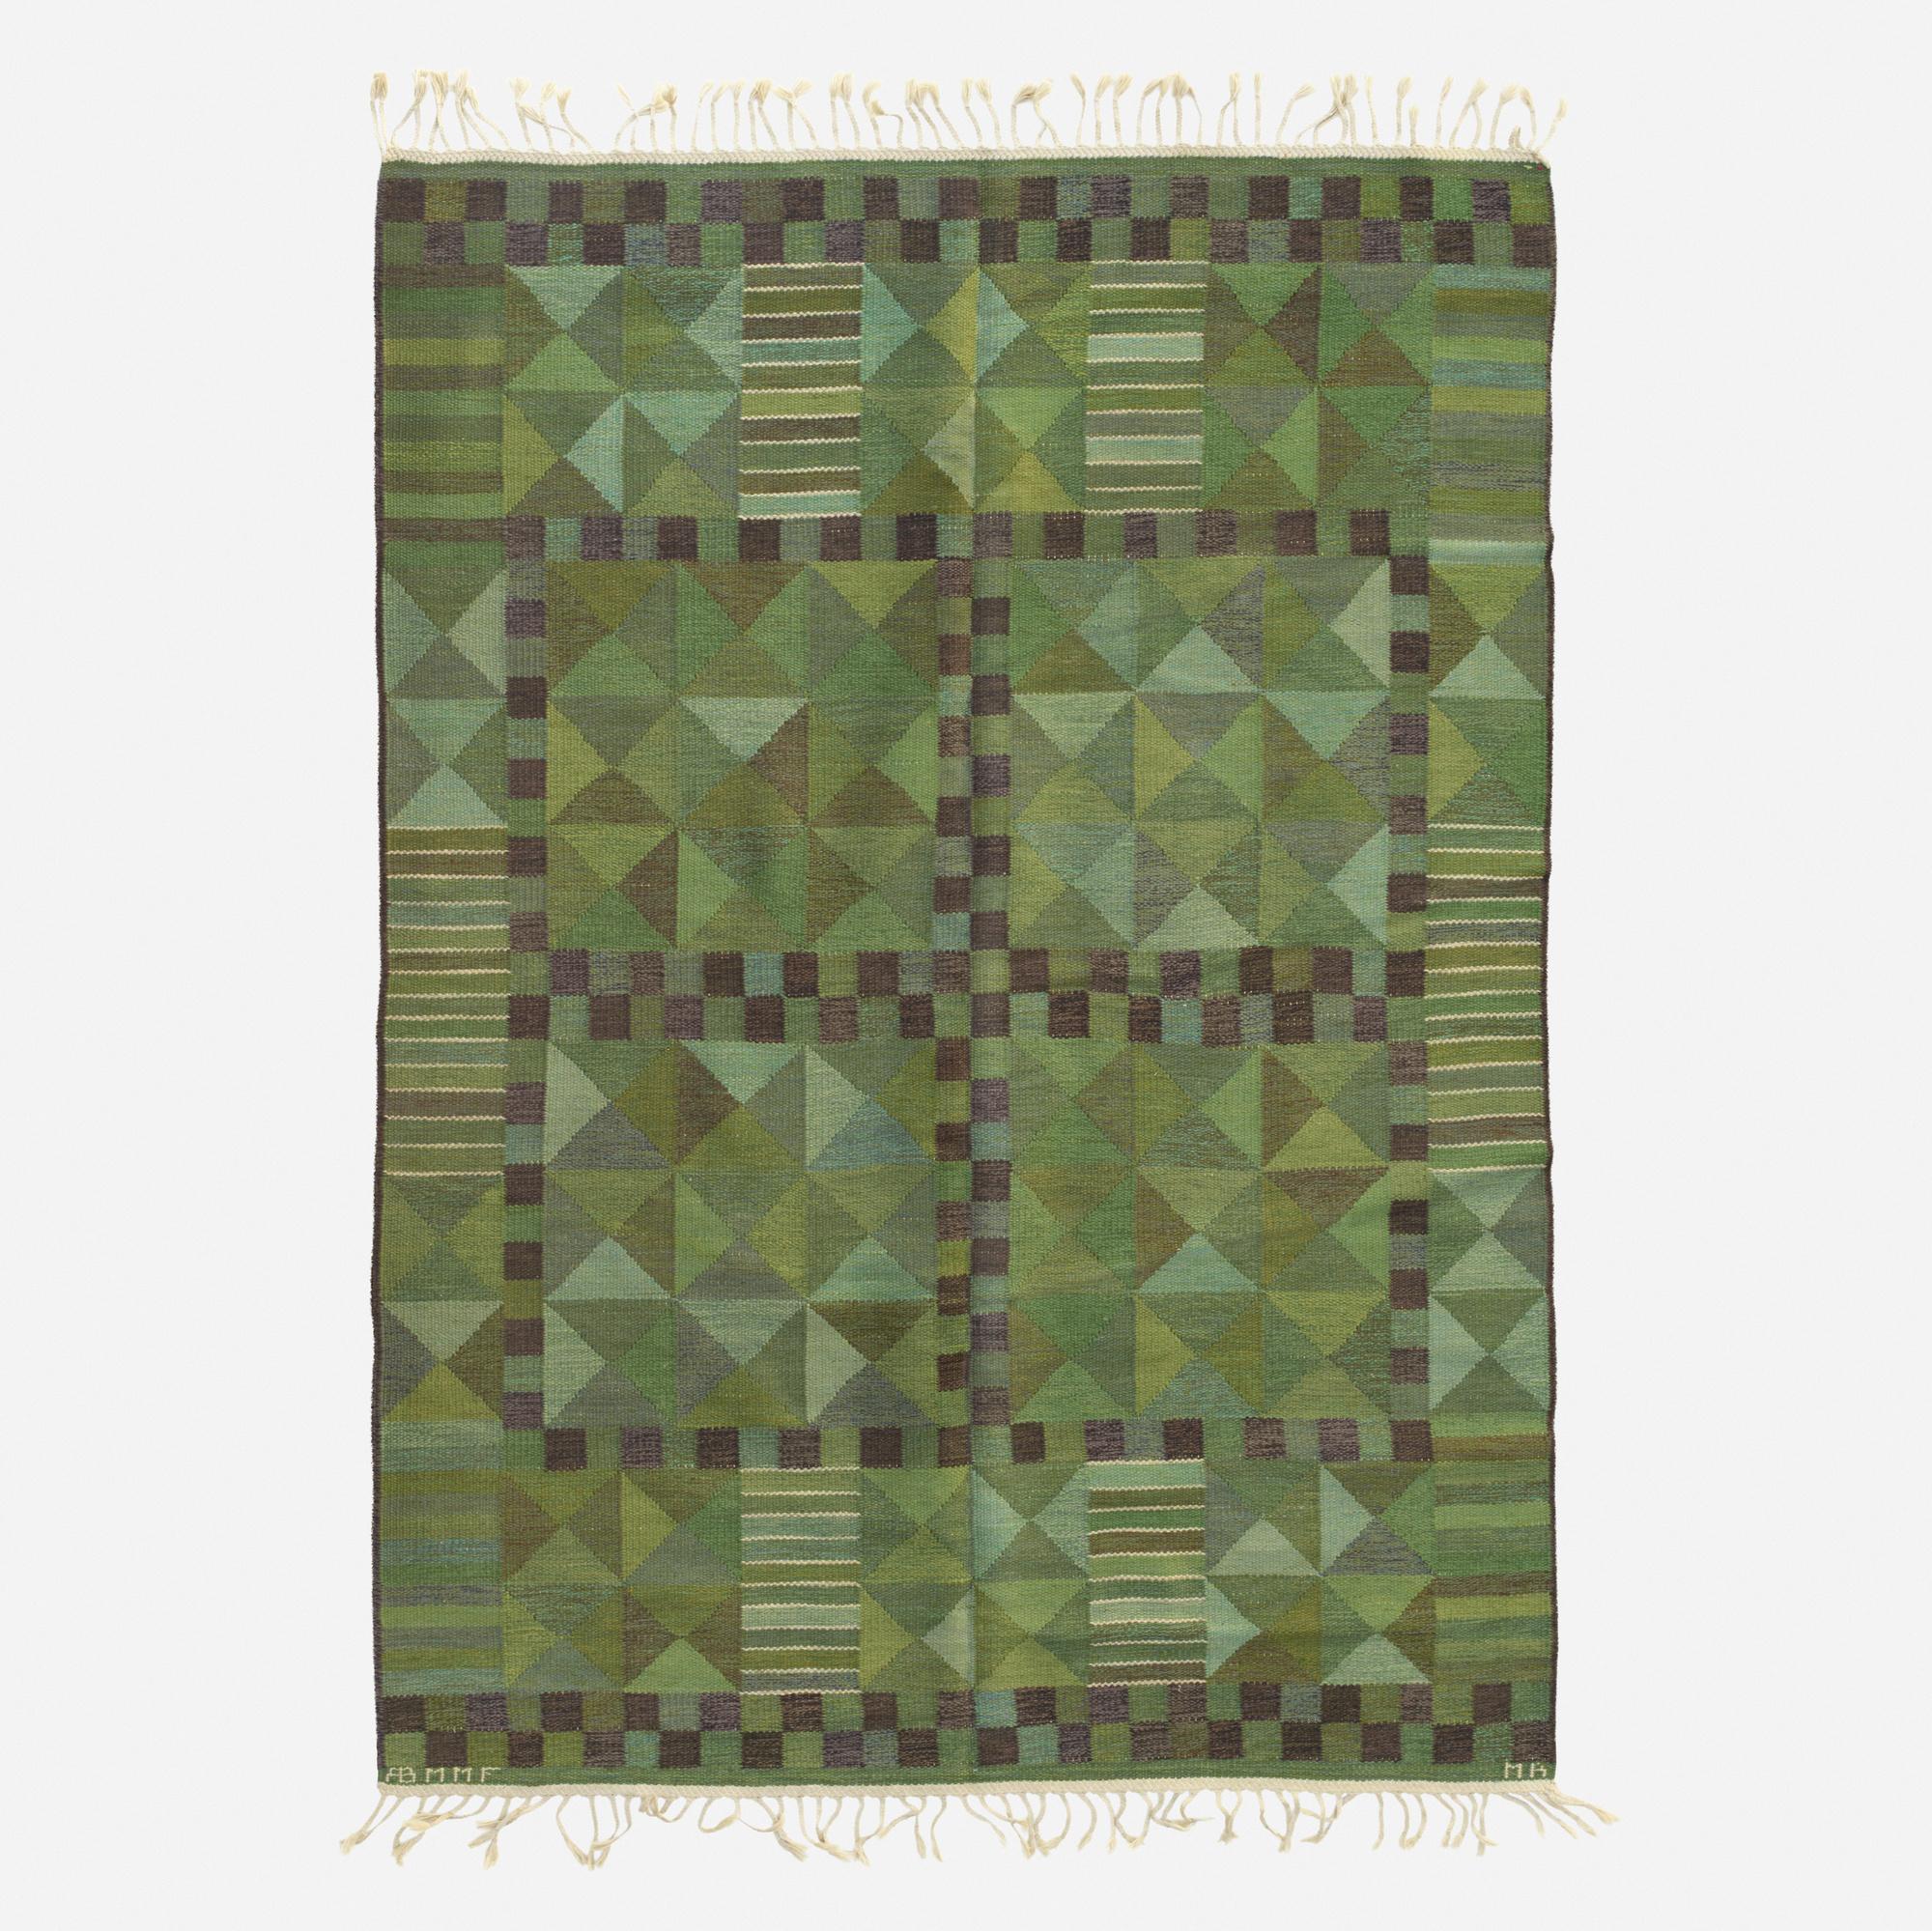 183: Marianne Richter / Rubirosa flatweave carpet (1 of 2)